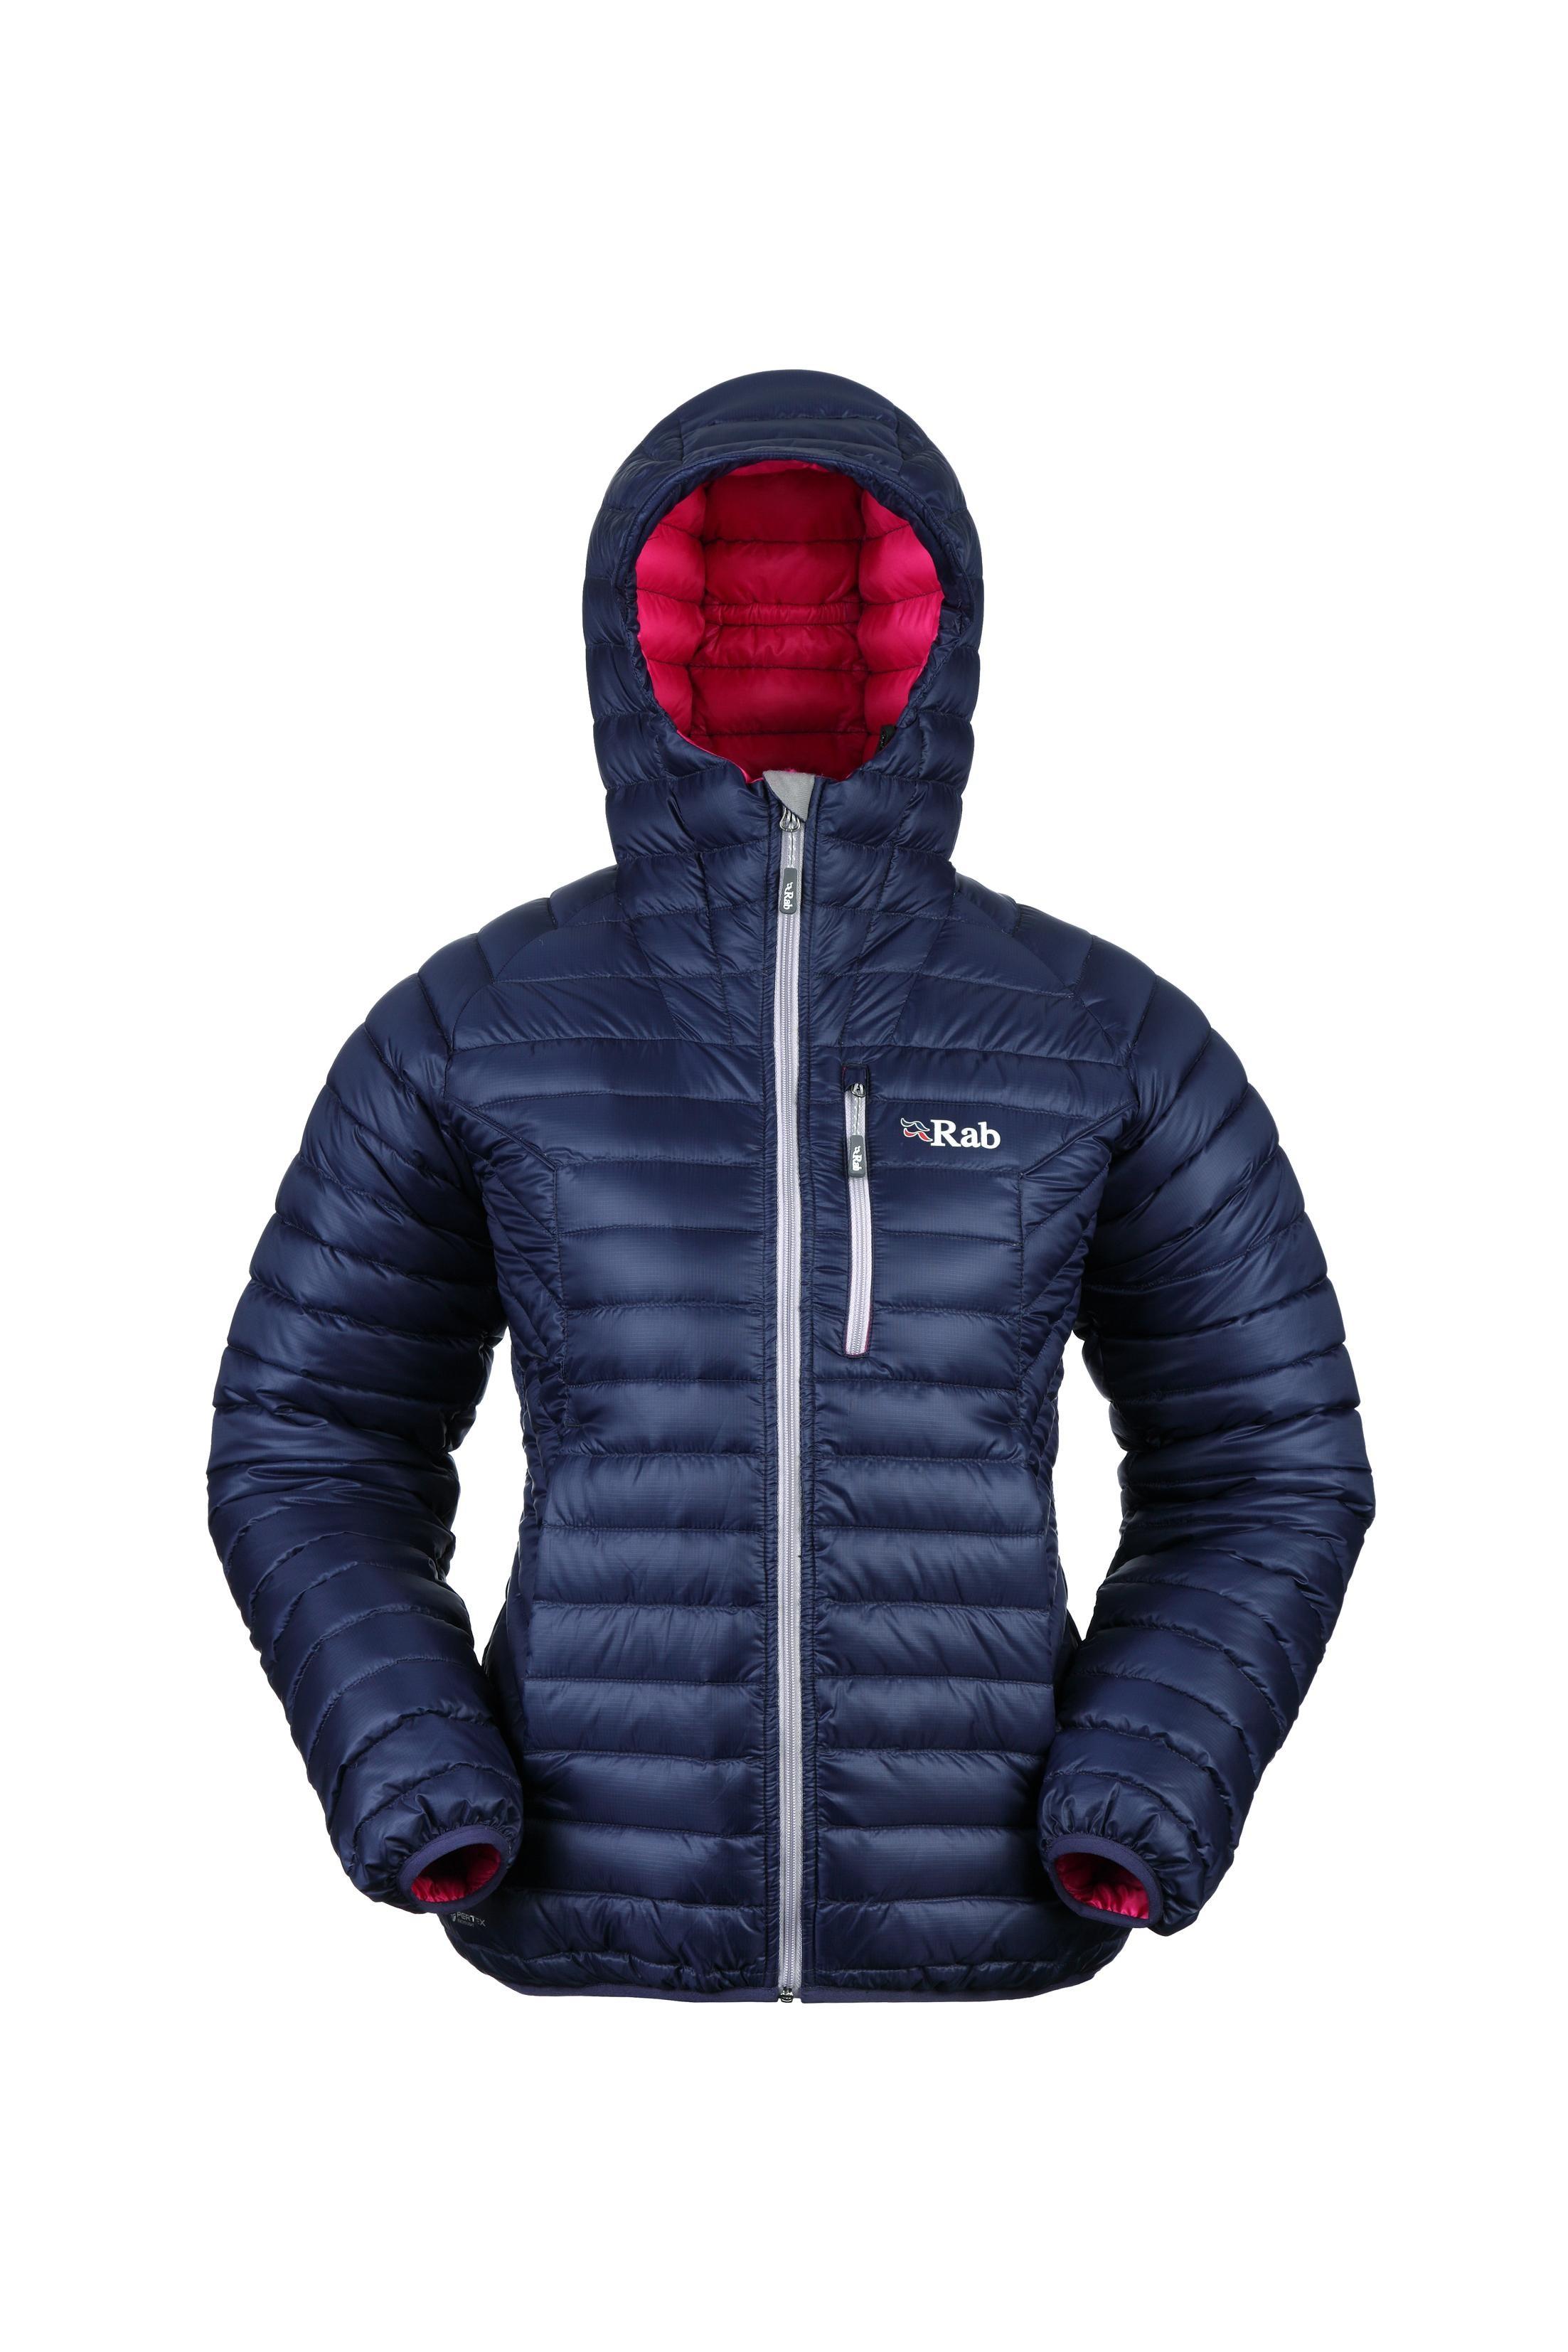 Rab Microlight Alpine Women S Down Jacket By Rab For 163 160 00